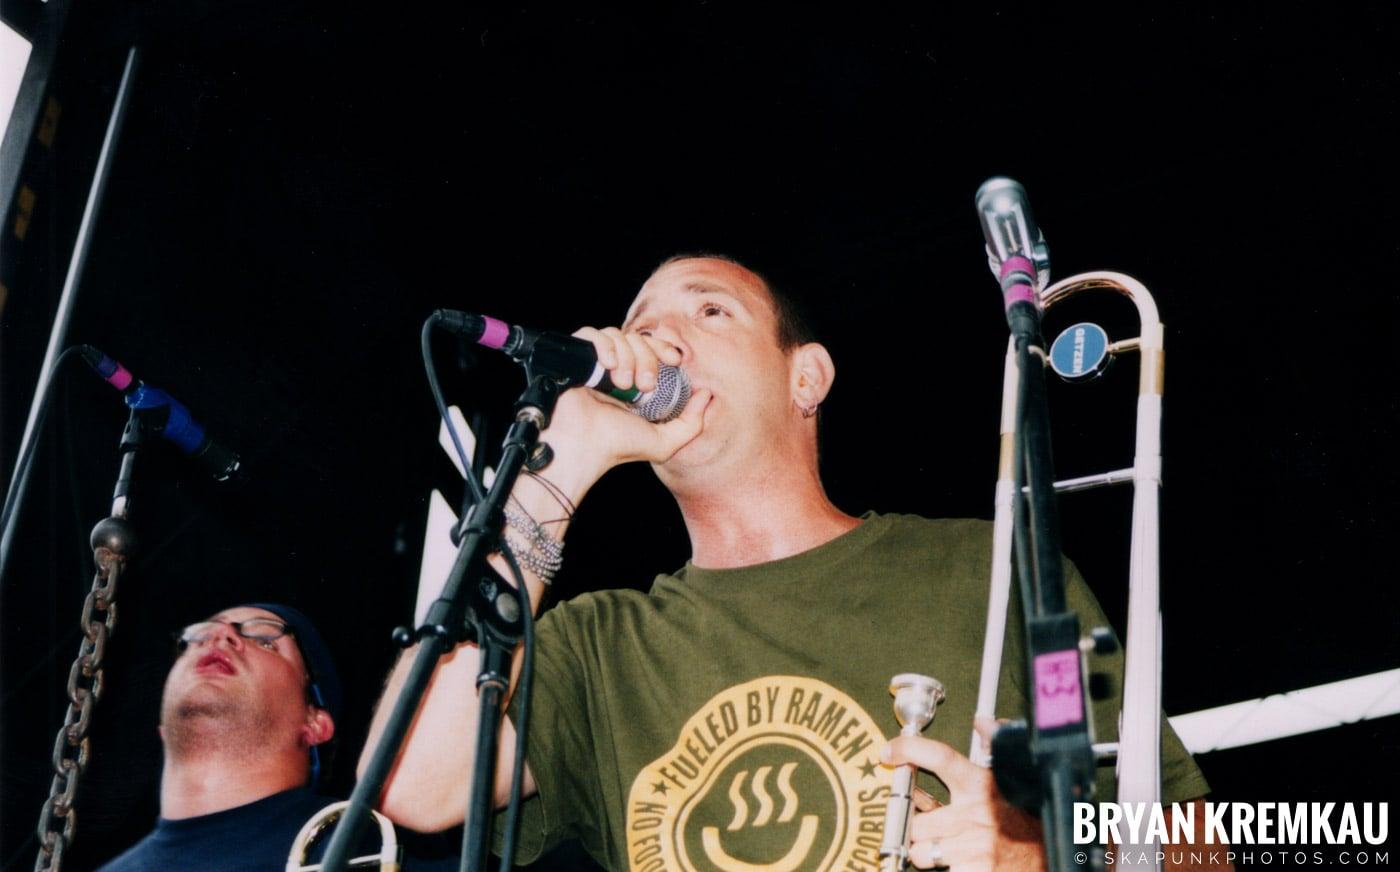 Less Than Jake @ Vans Warped Tour, Randall's Island, NYC - 8.4.01 (21)